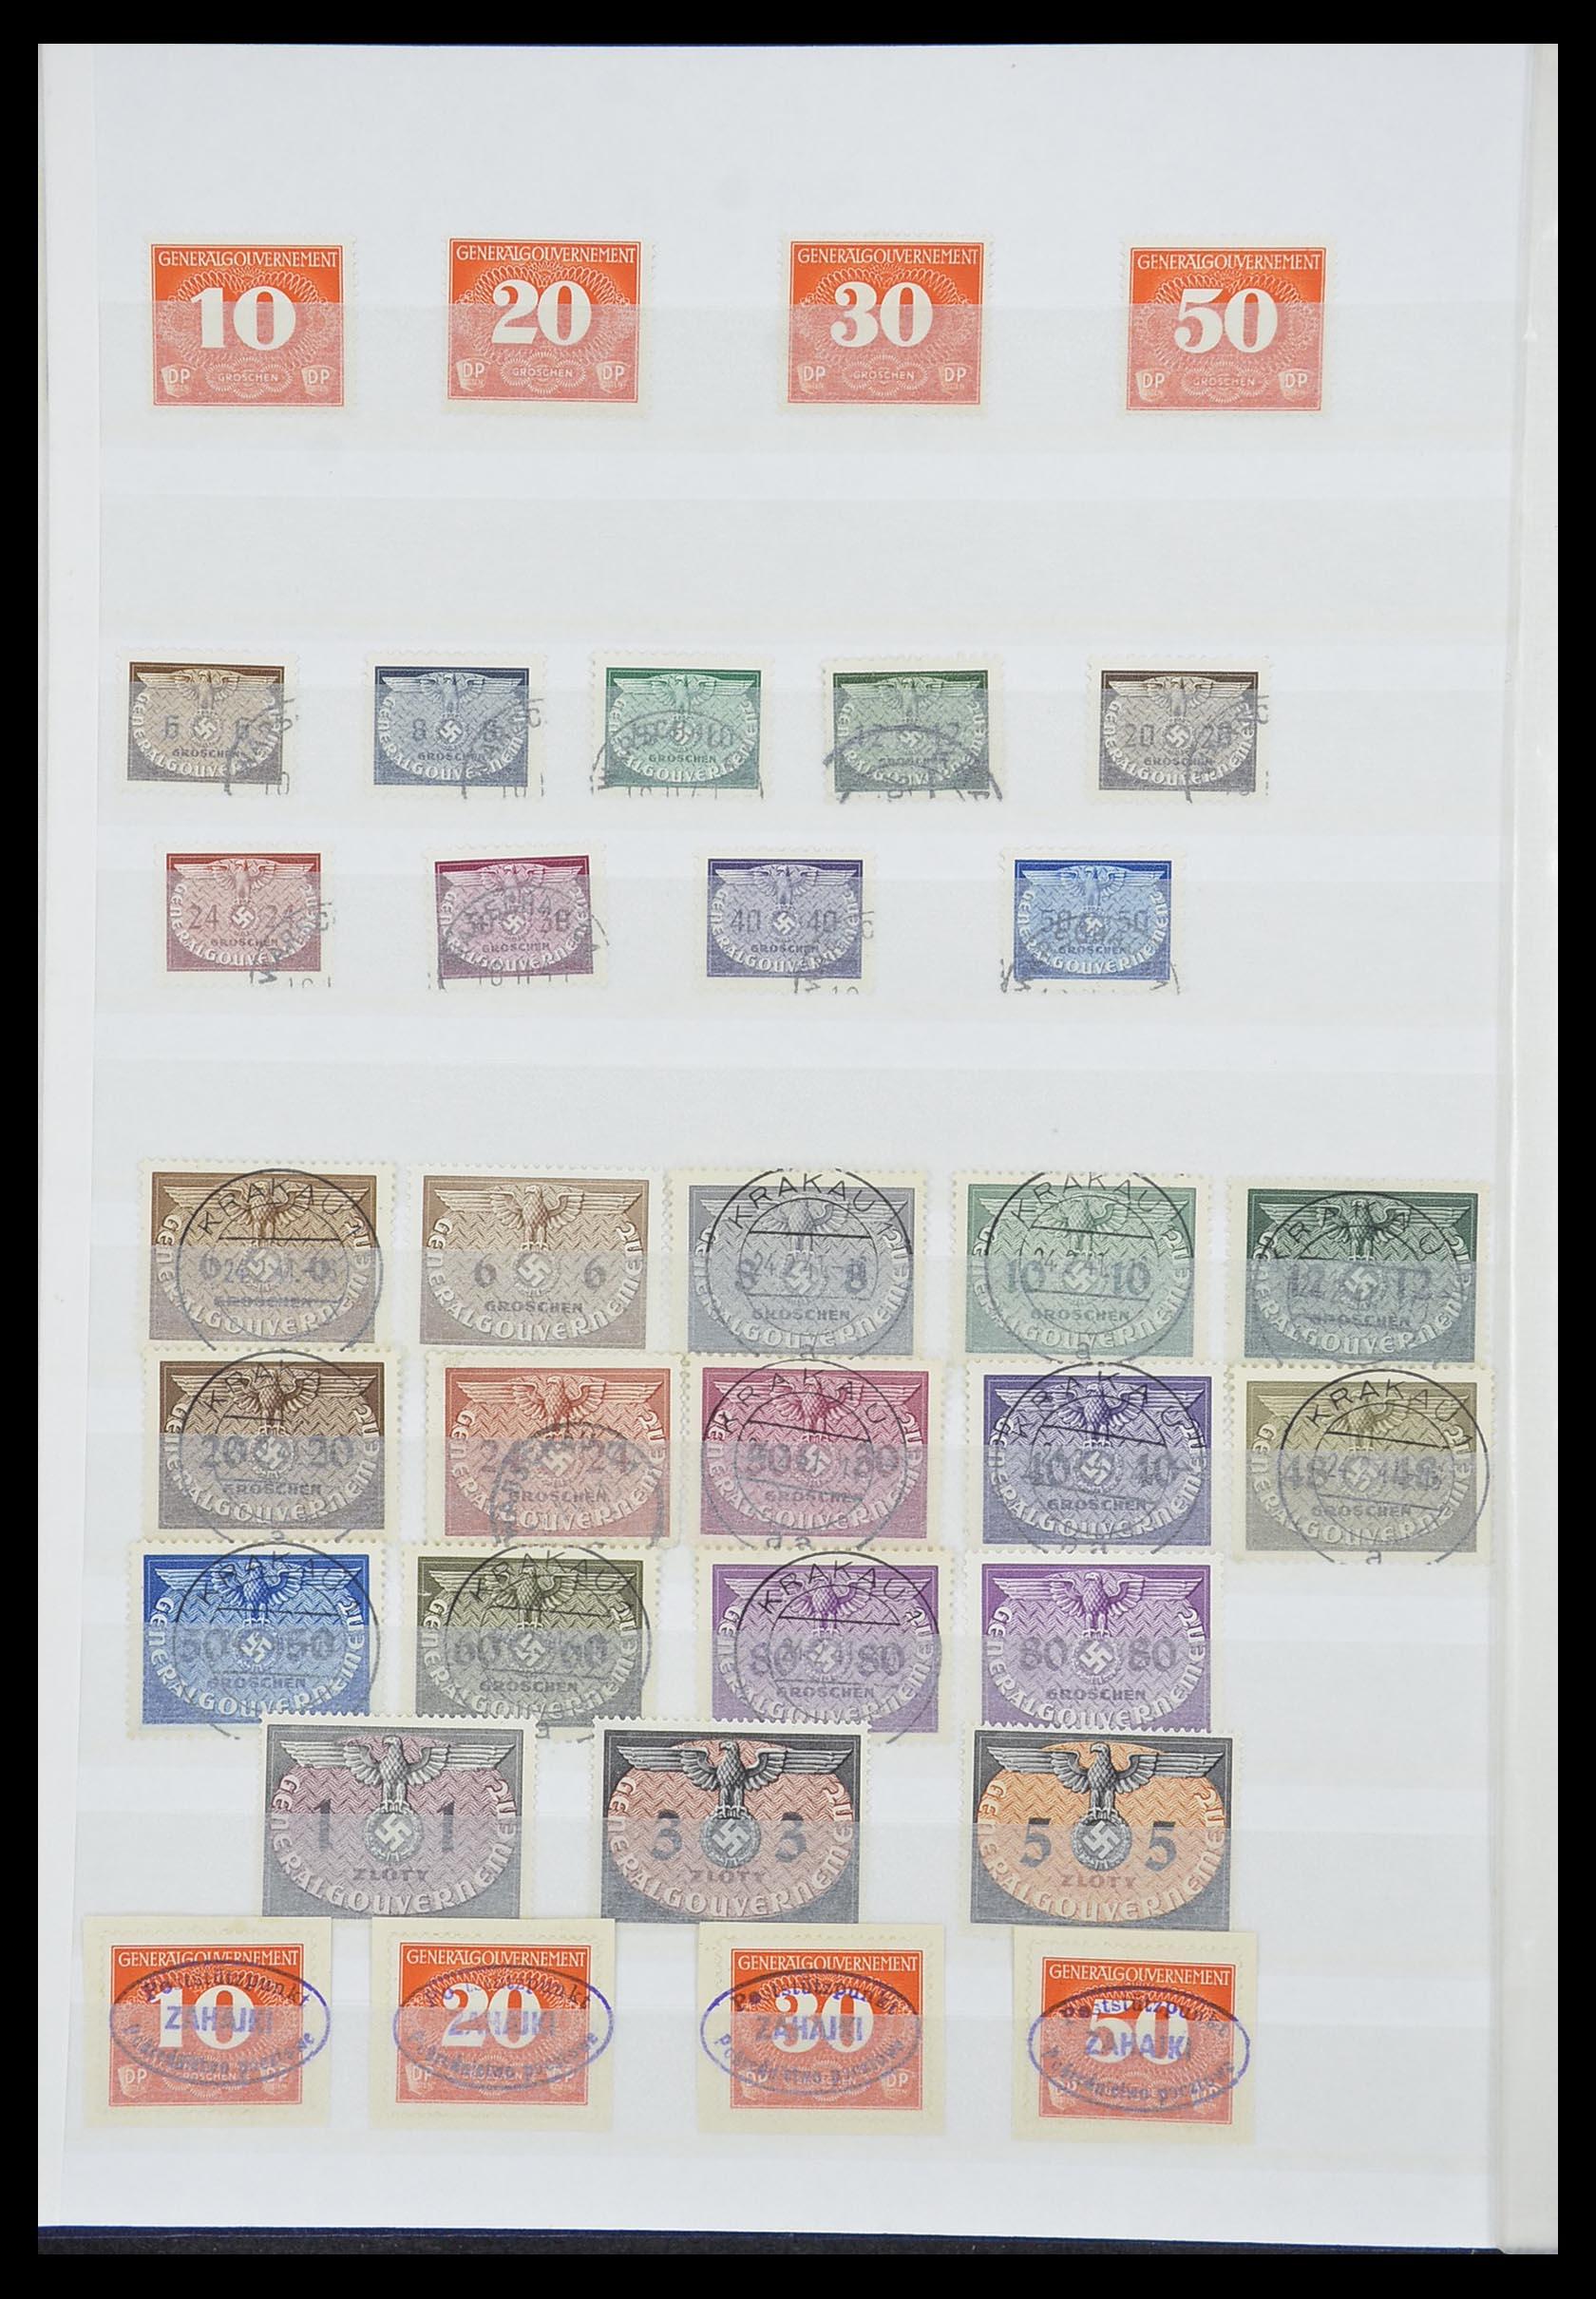 33850 005 - Postzegelverzameling 33850 Duitse bezettingen 2e wereldoorlog 1939-19